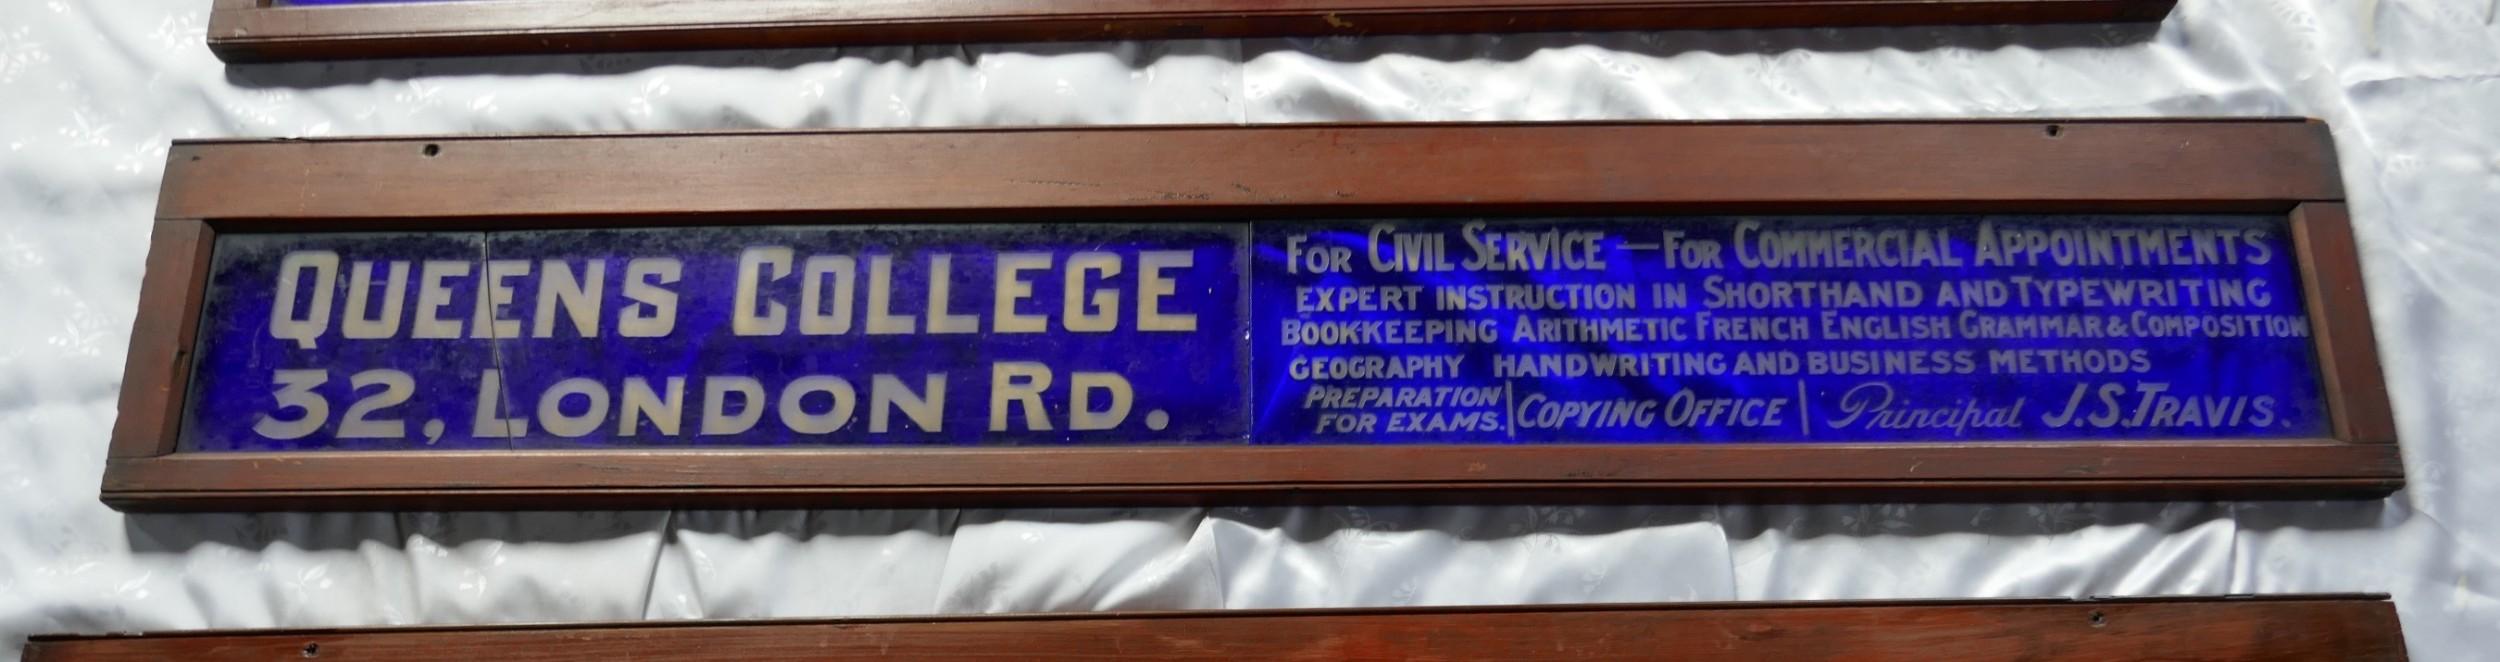 19th century blue glass tram window advertisement